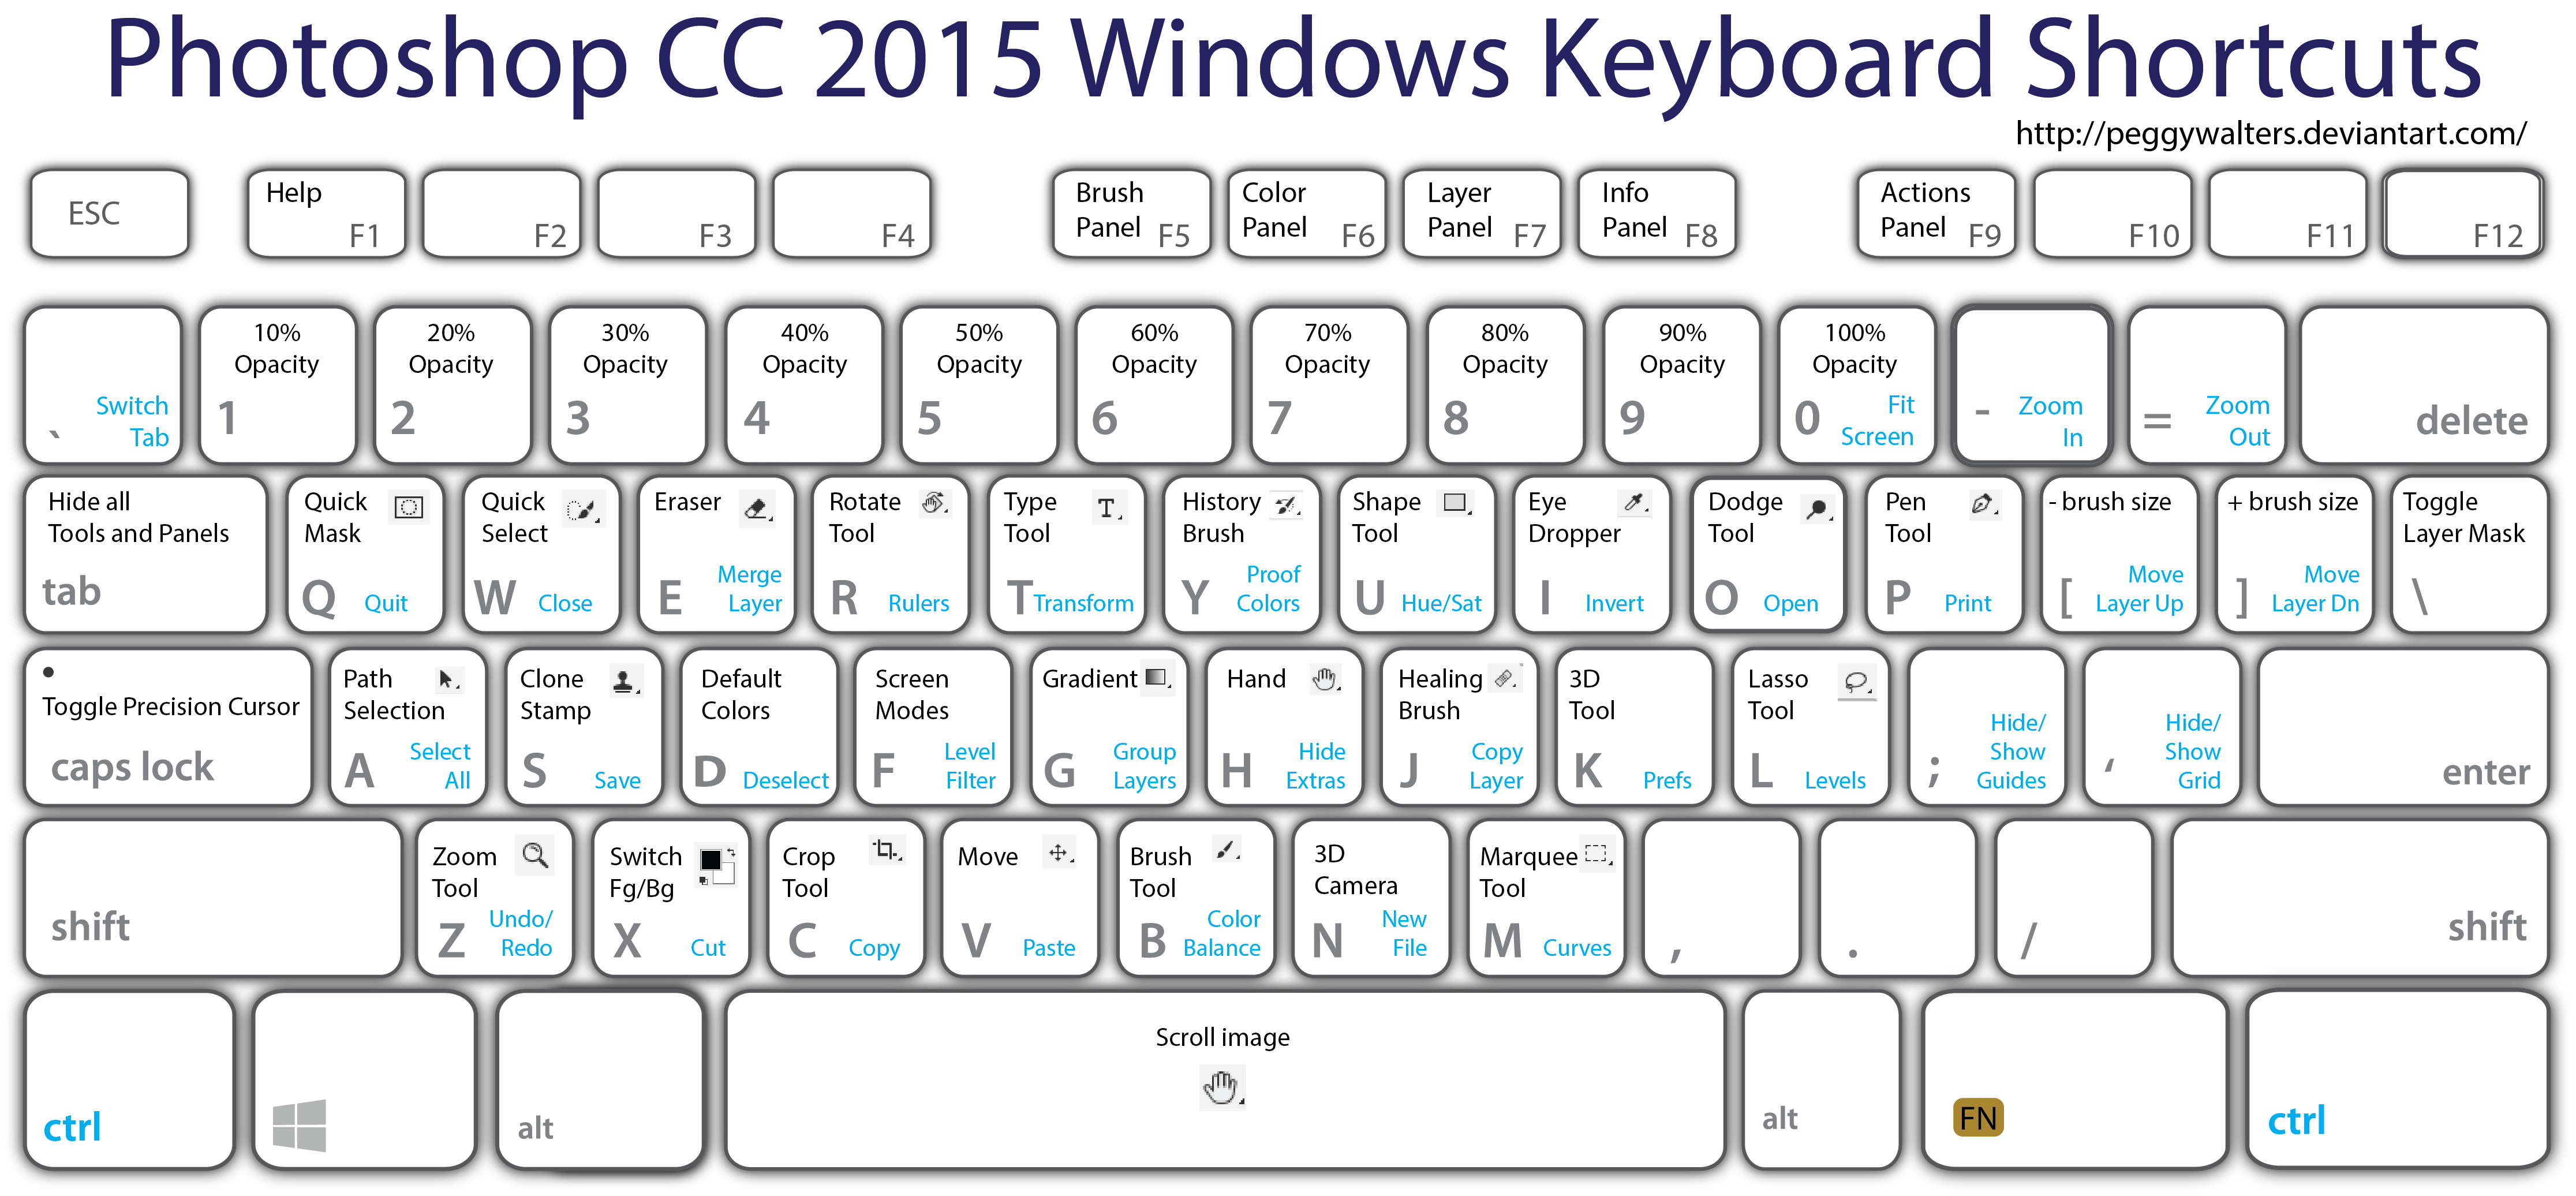 windows keyboard shortcuts wallpaper - photo #29